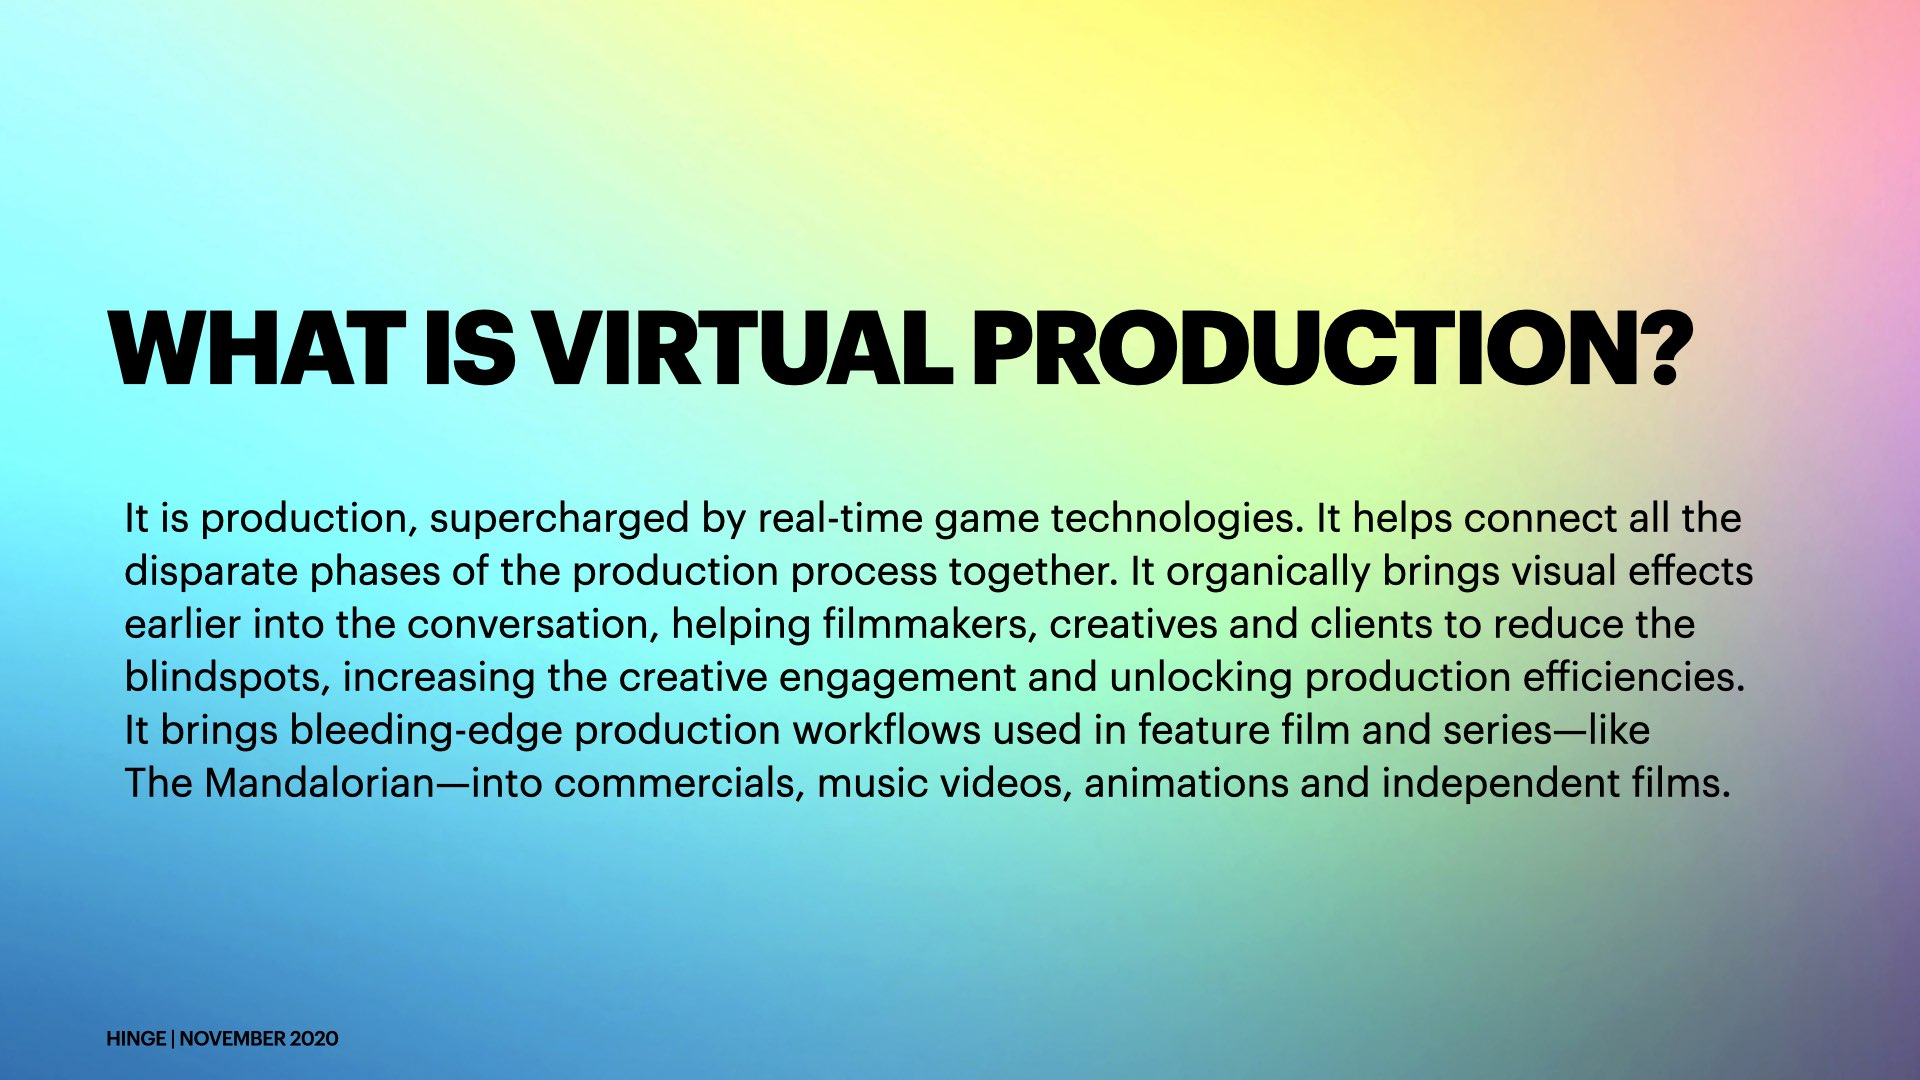 Hinge_Virtual_Production_02